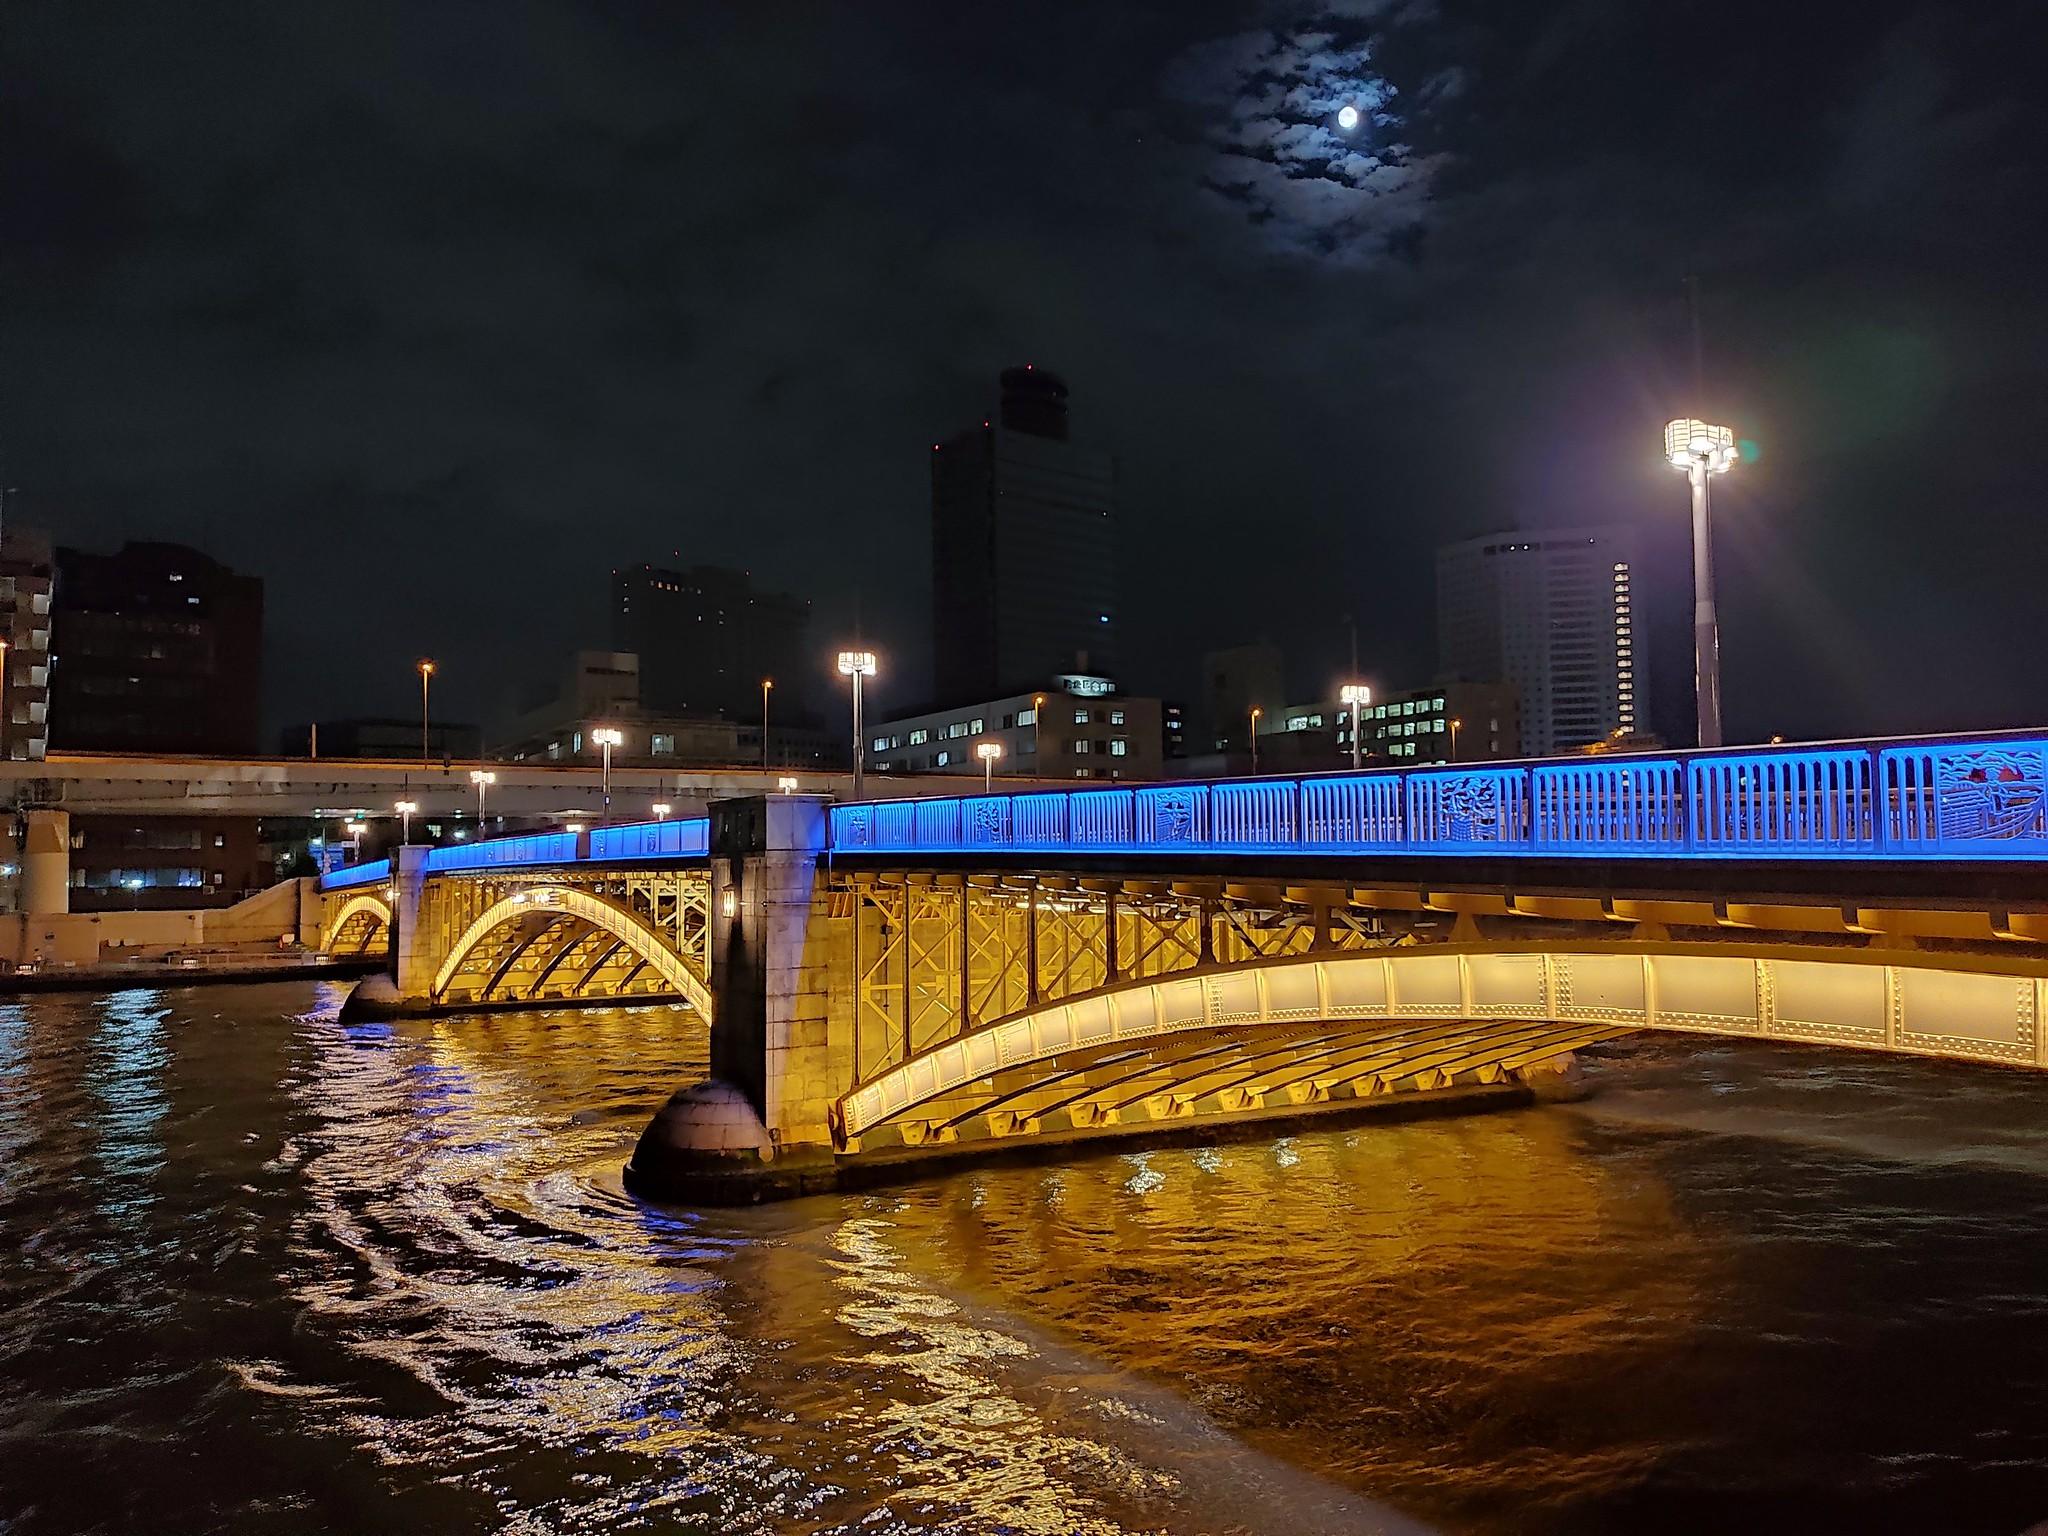 Redmi Note 9Sのカメラで撮影 - 夜景